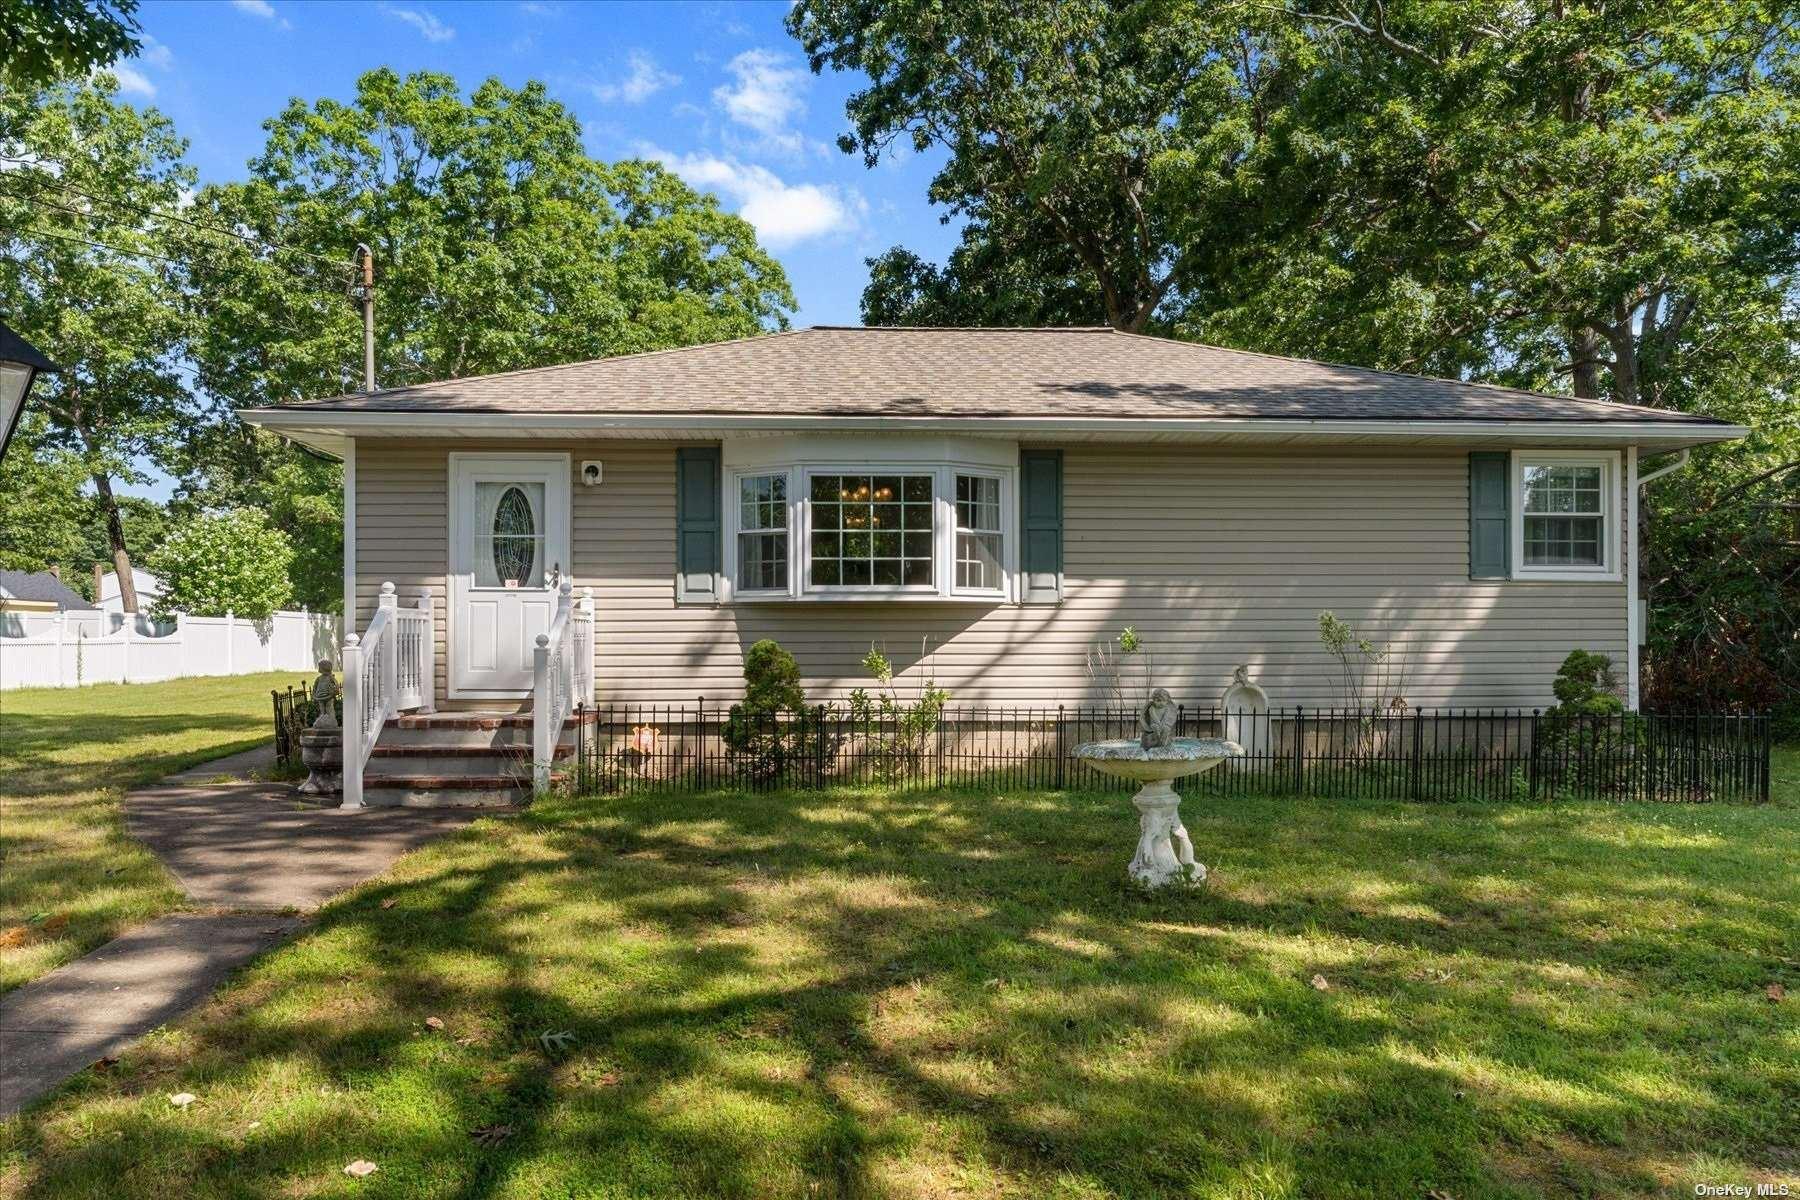 219 Colin Drive, Shirley, NY 11967 - MLS#: 3332425